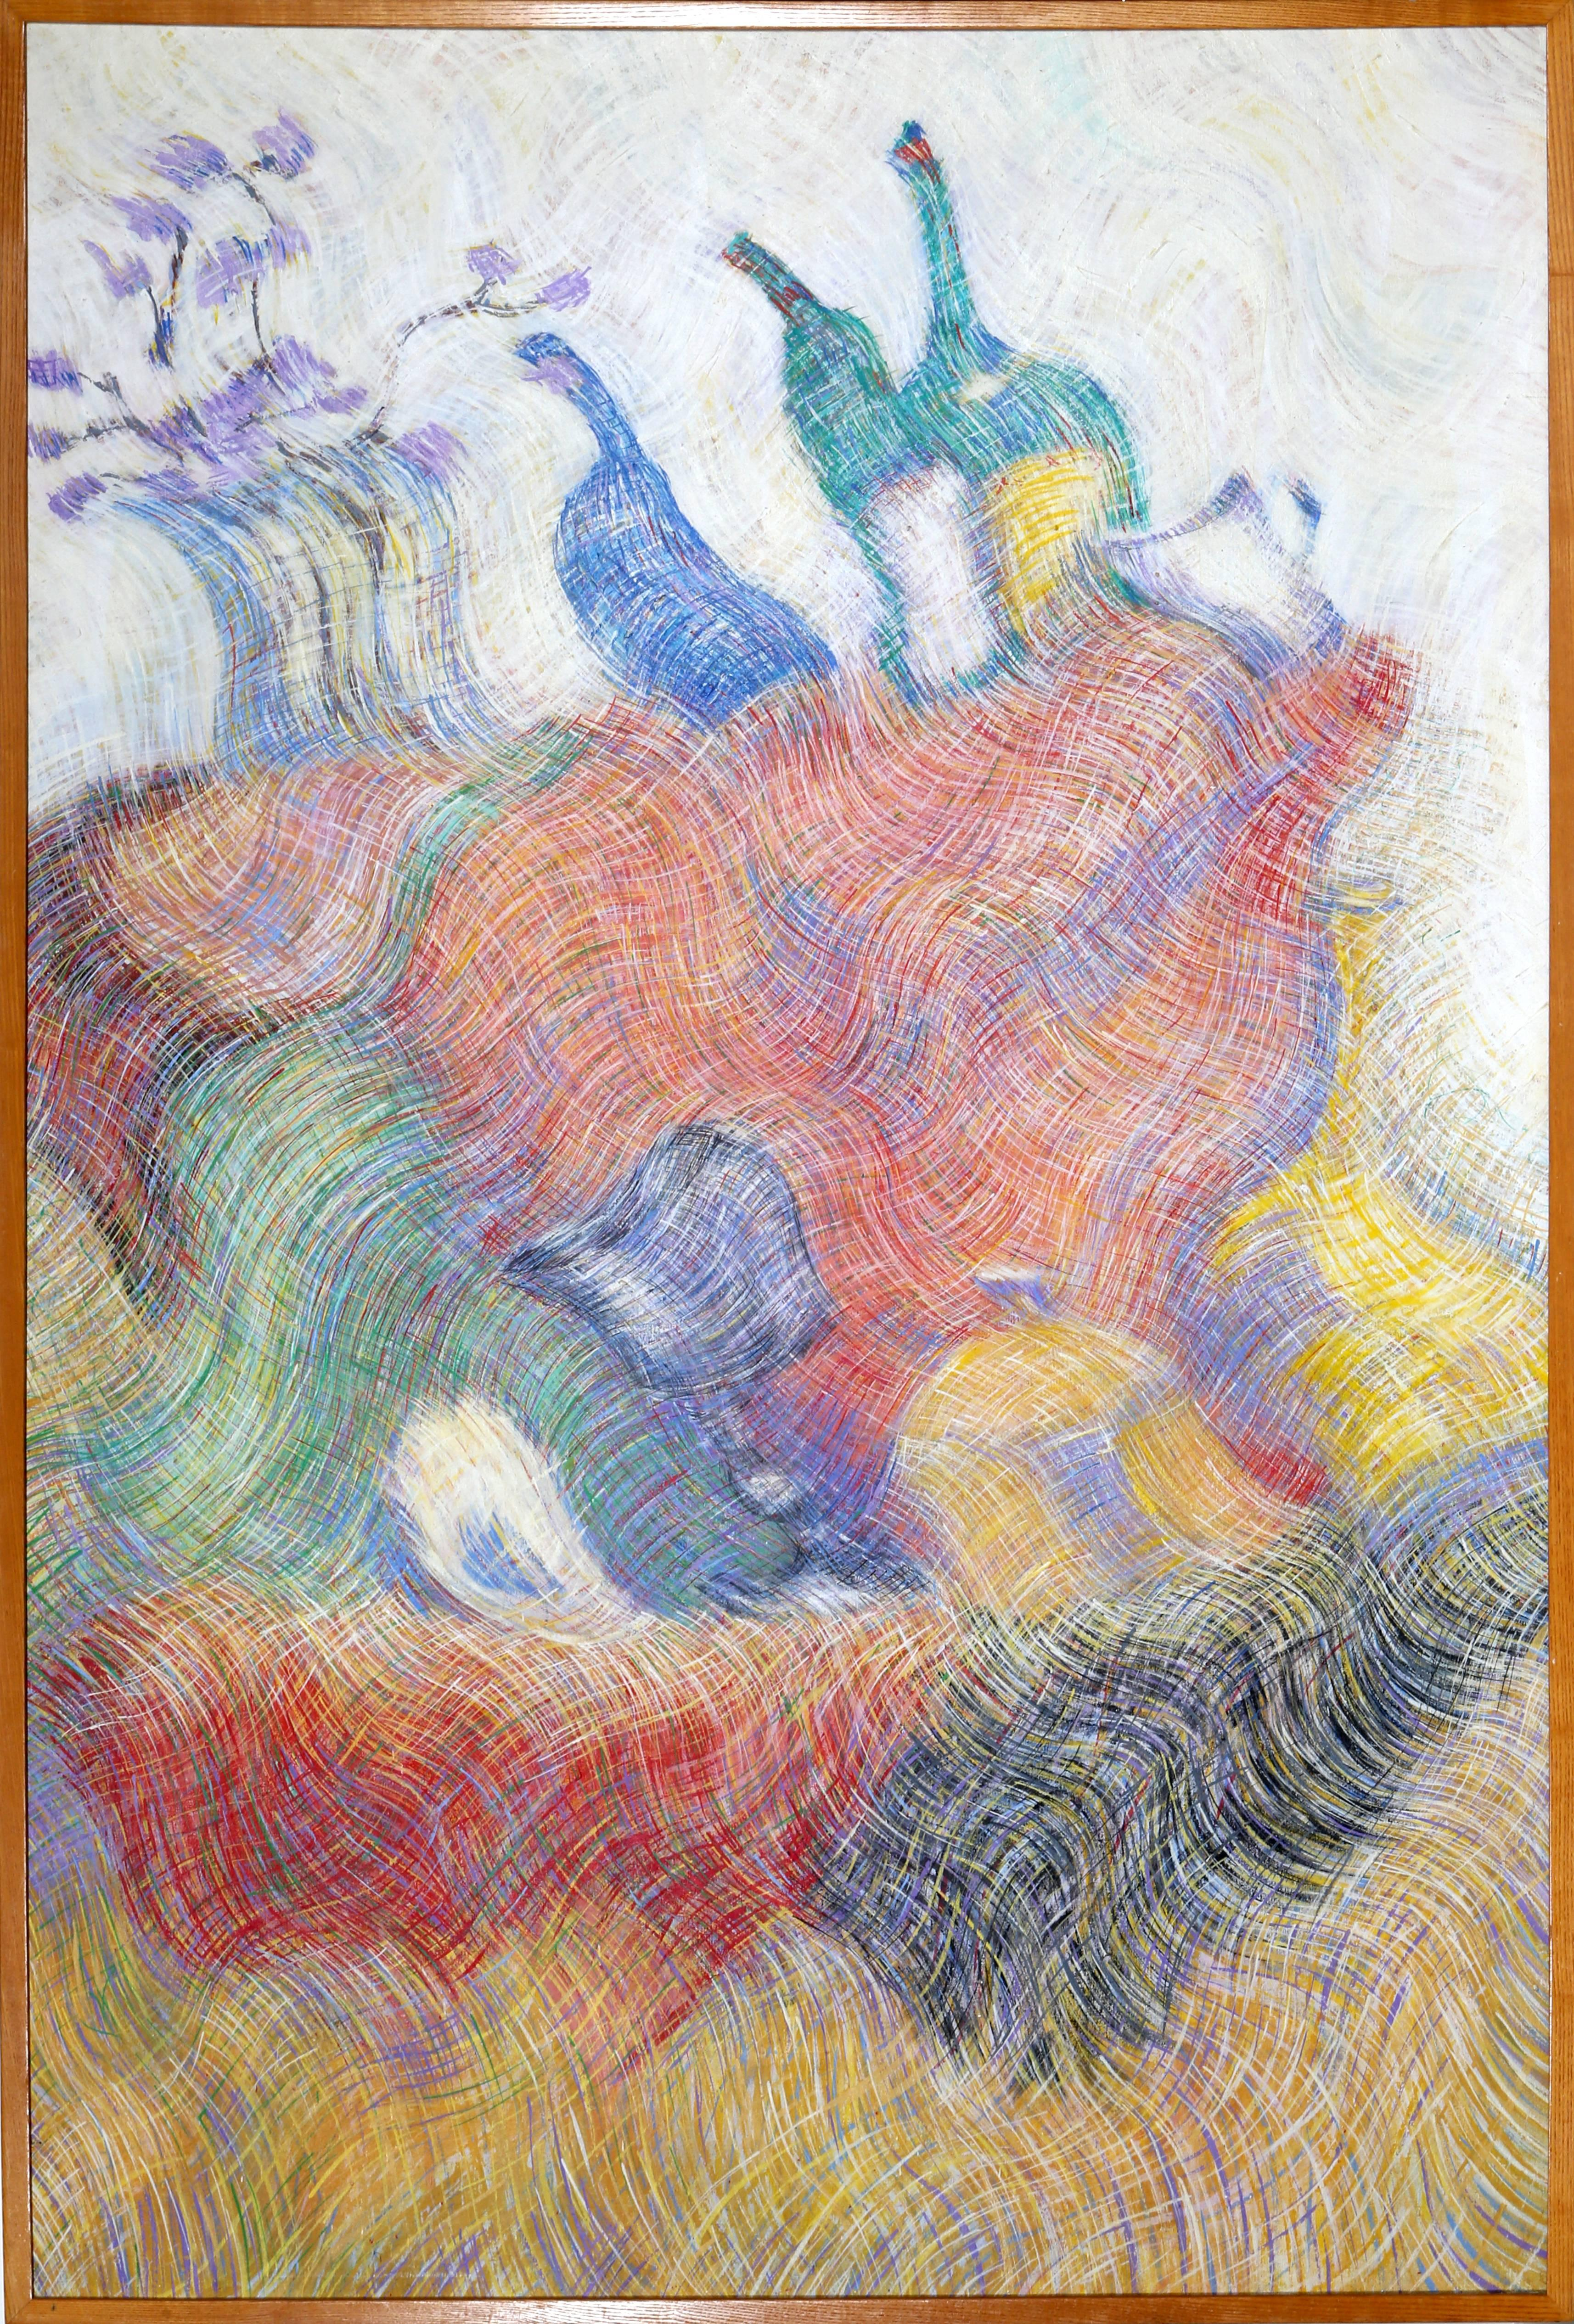 Bodegon 5, Large Surreal Still Life by Juan Quiroz